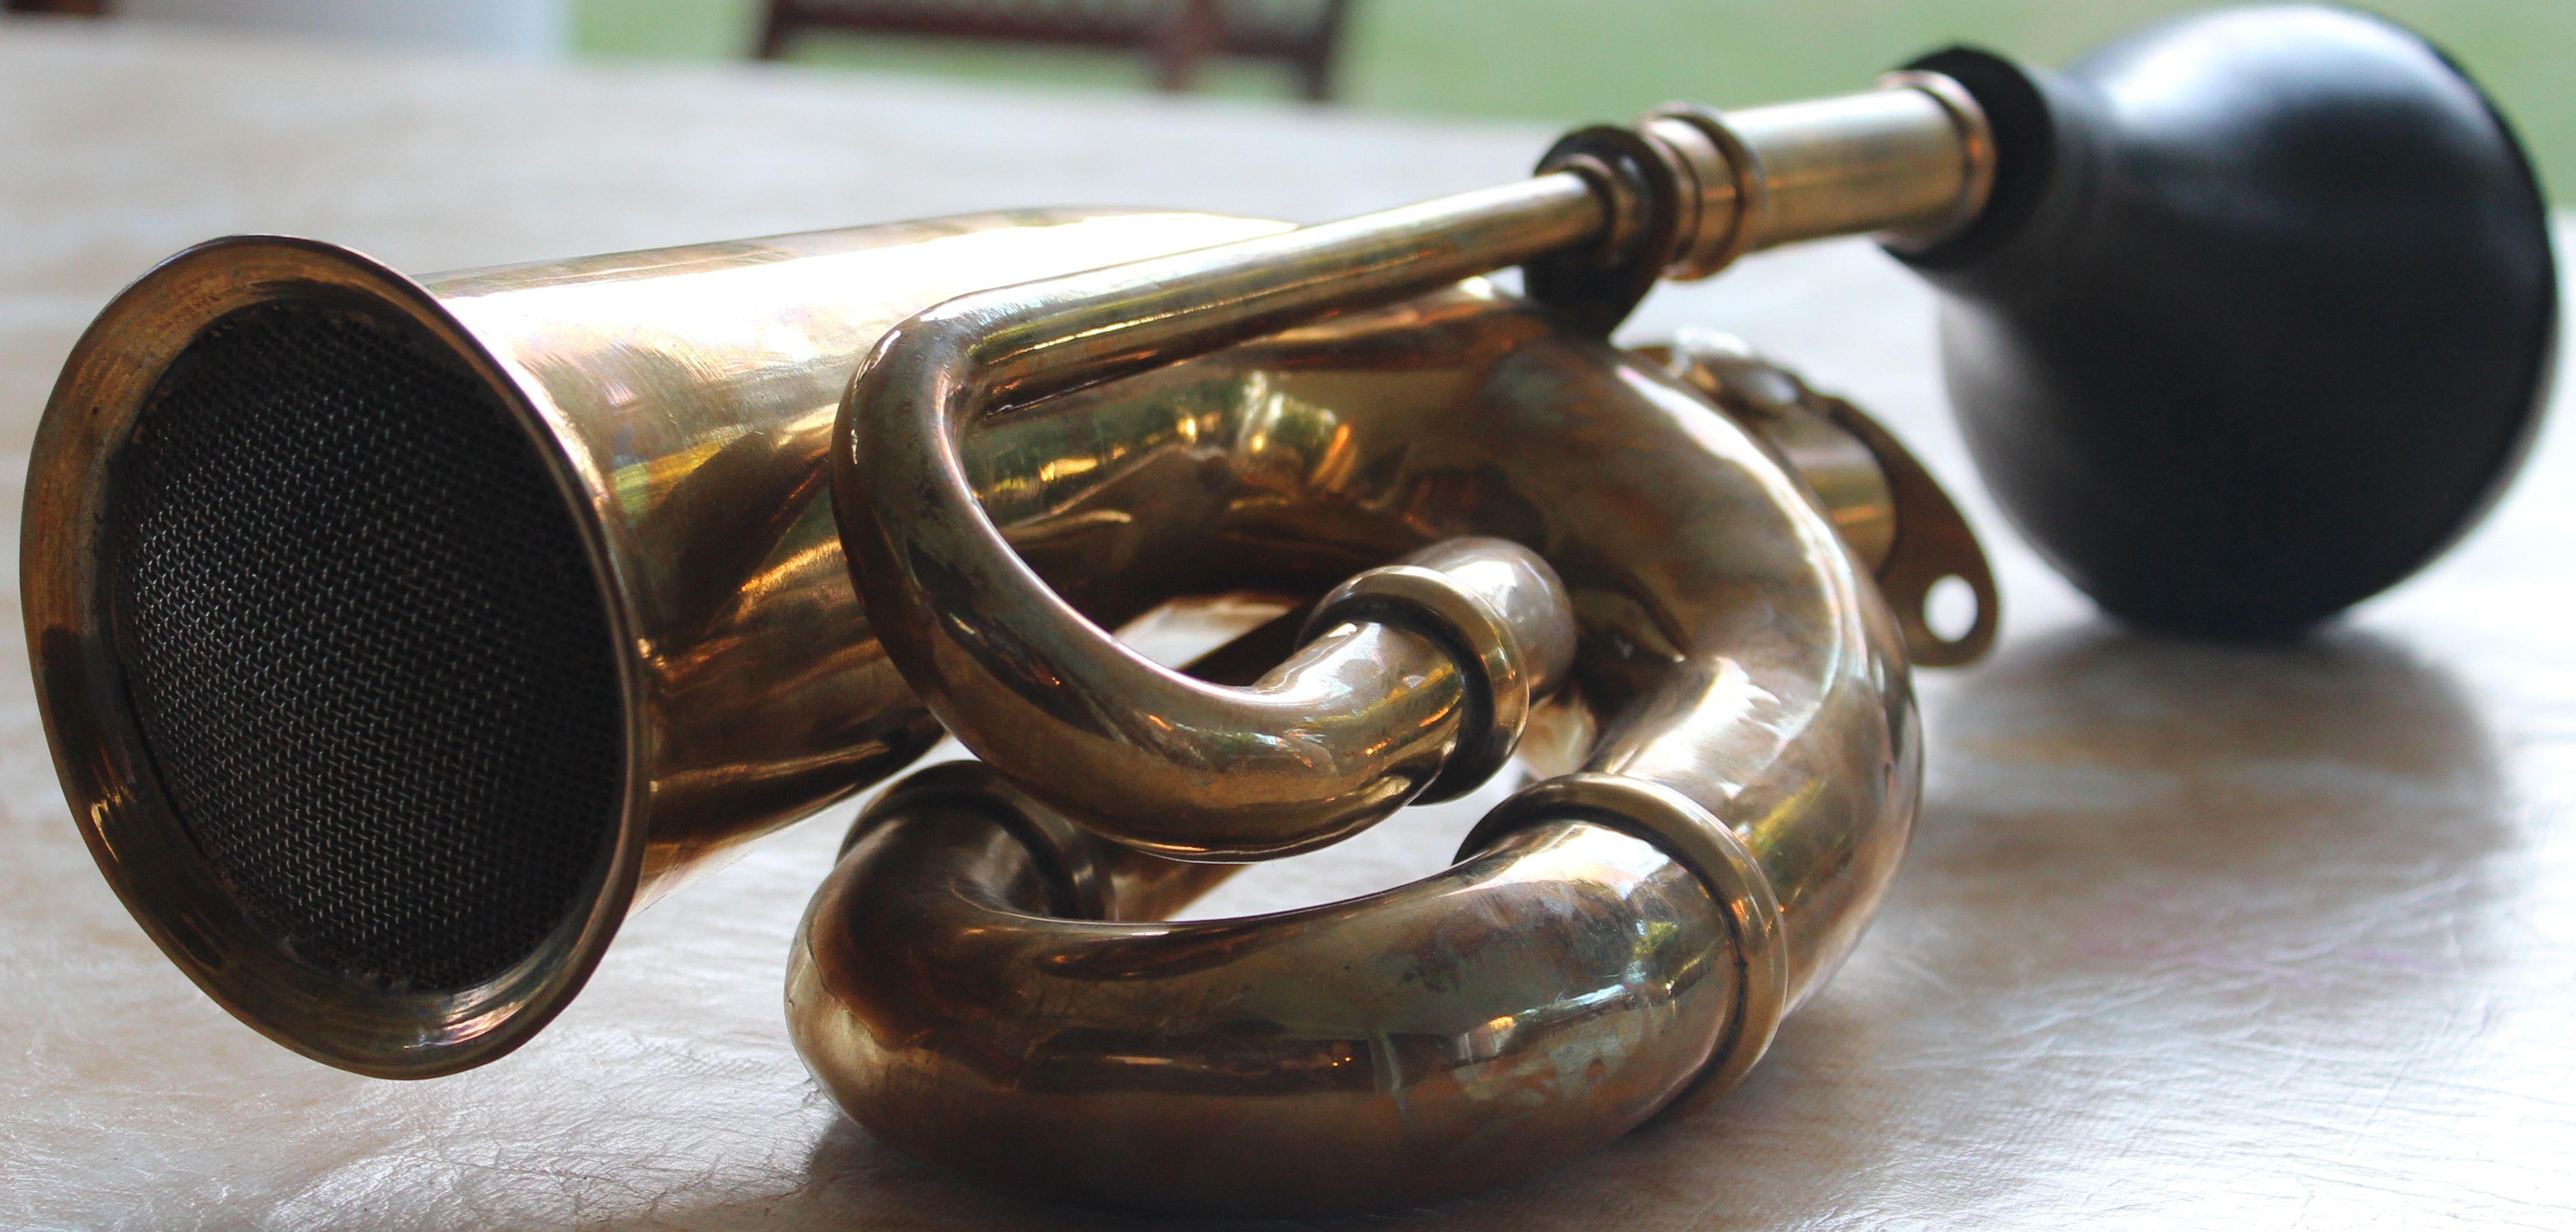 Mancuernas de corneta